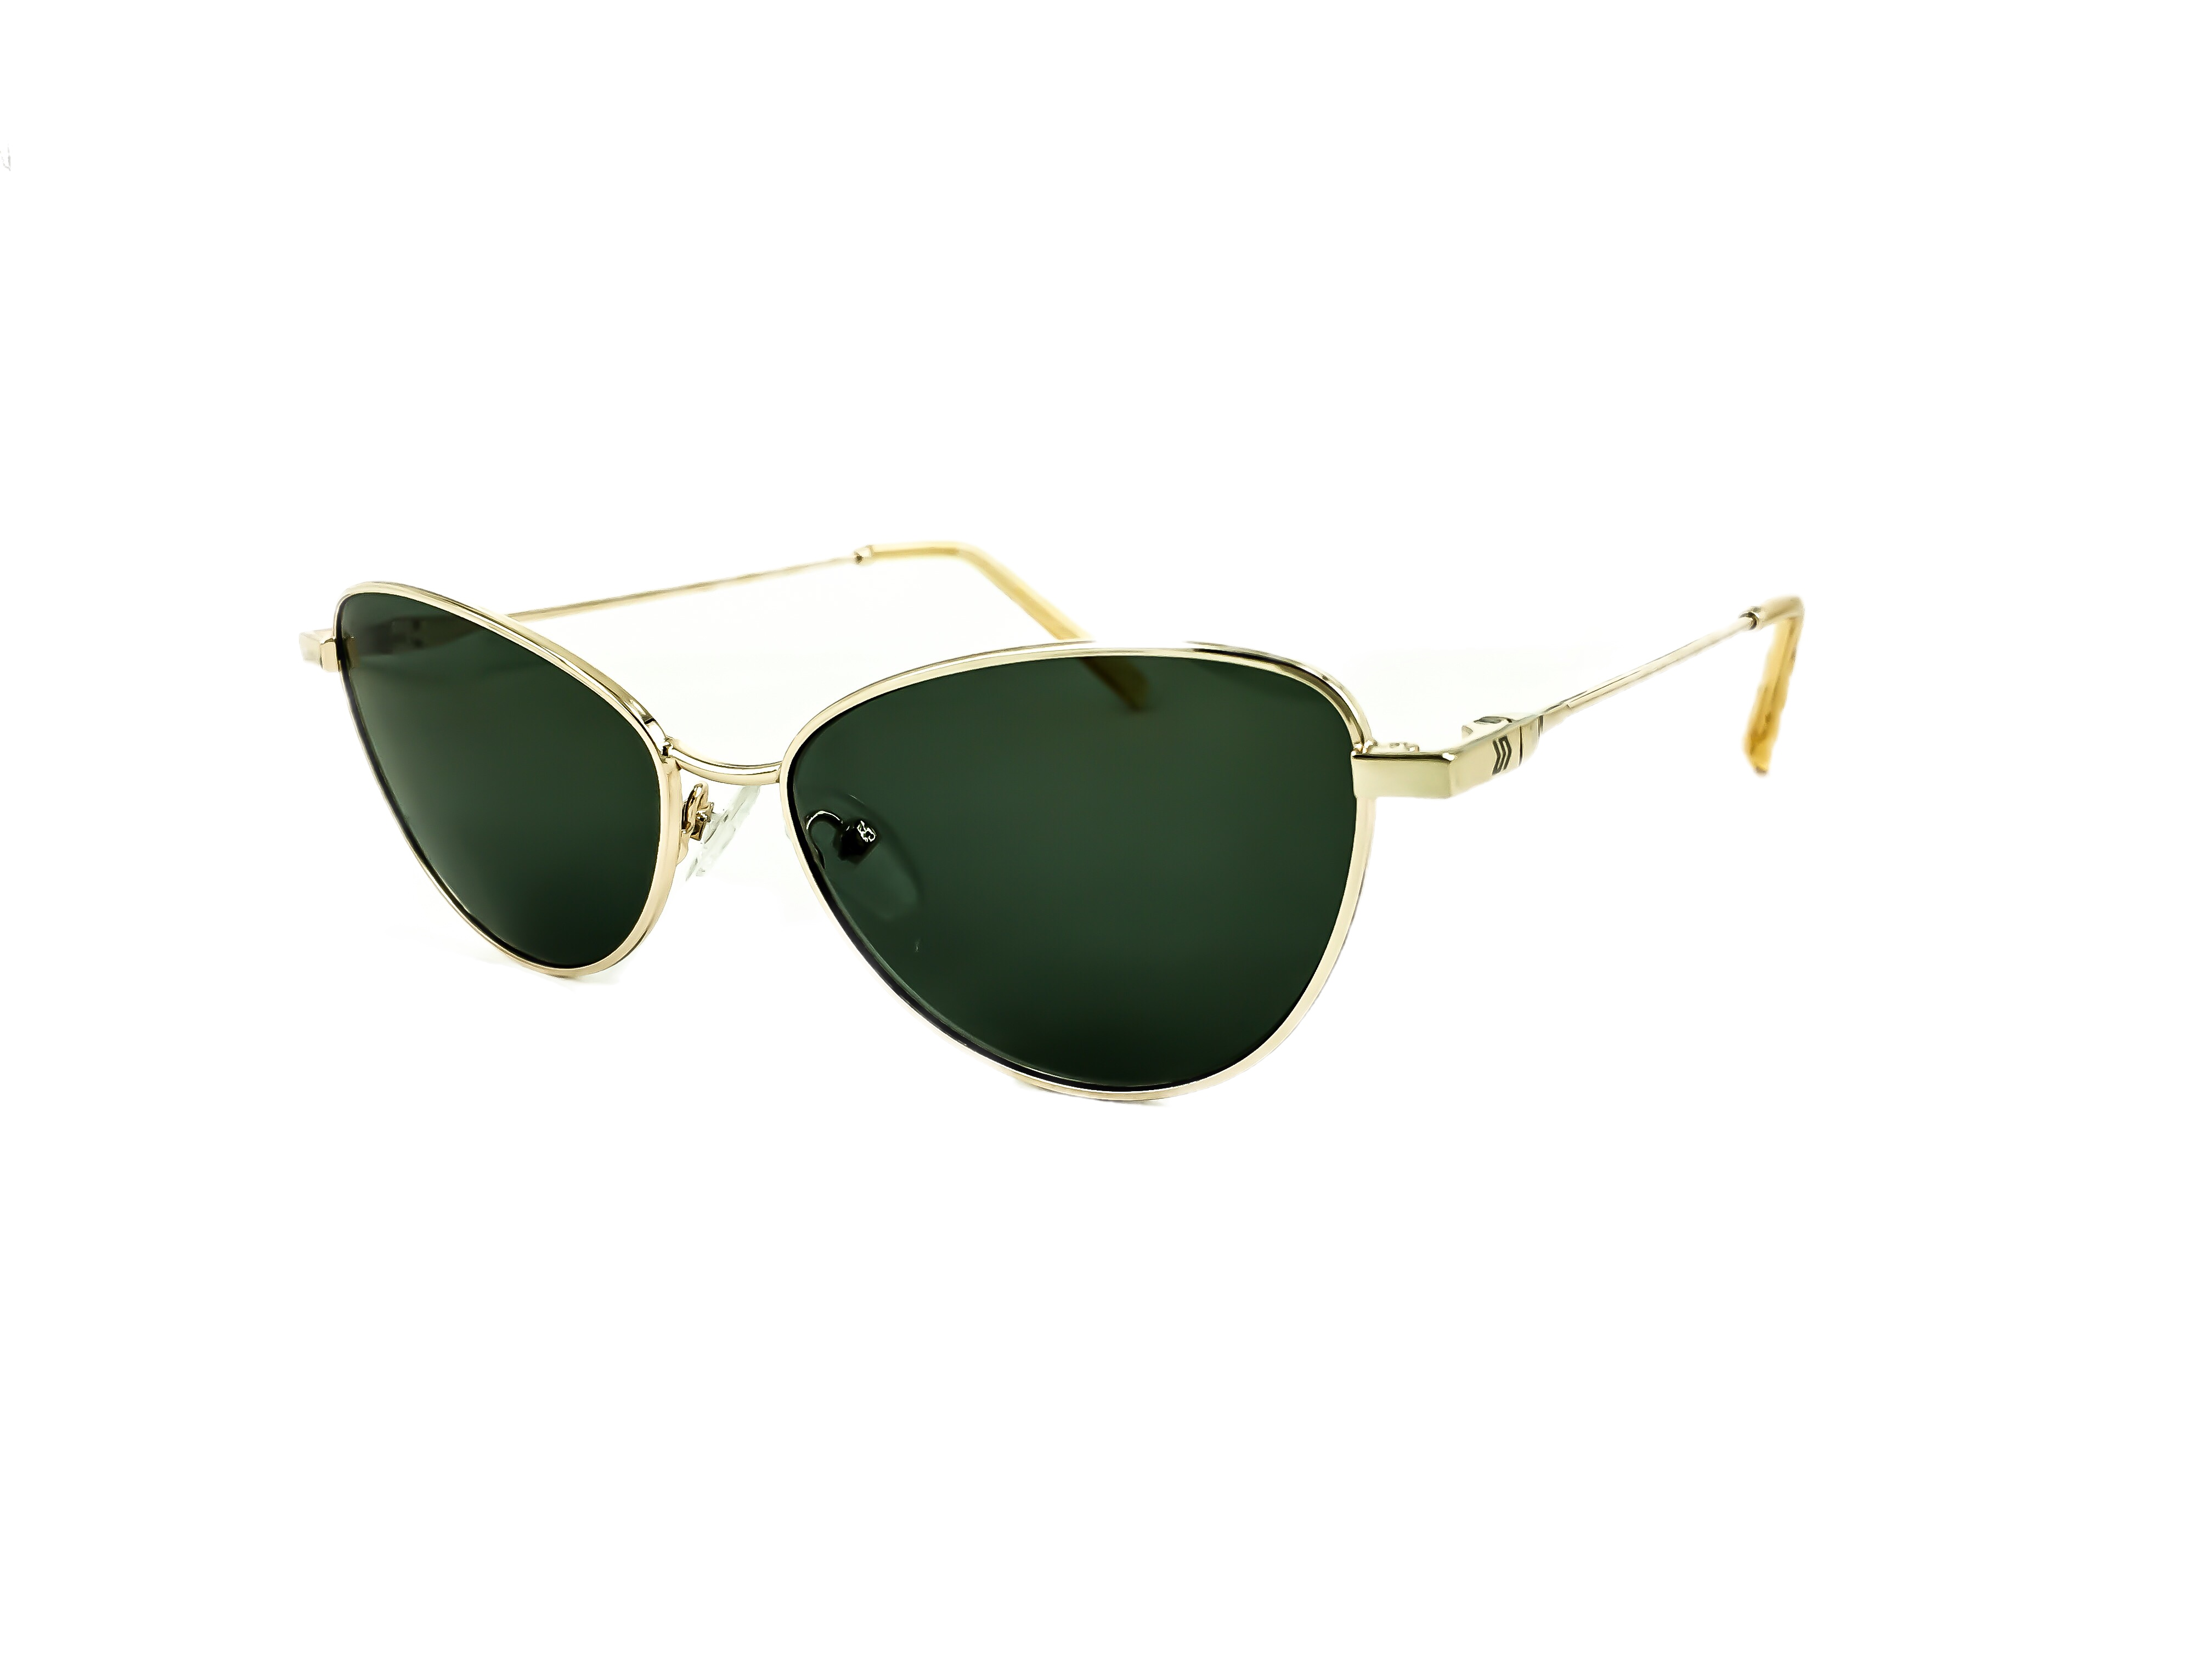 fc9b897593 Οι φακοί είναι οργανικοί με εσωτερική αντιανακλαστική επίστρωση και πράσινο  σκούρο φακό. Τα γυαλιά ηλίου NO IDOLS ONEDIET04 CAT.3 53 ταιριάζουν ιδανικά  σε ...